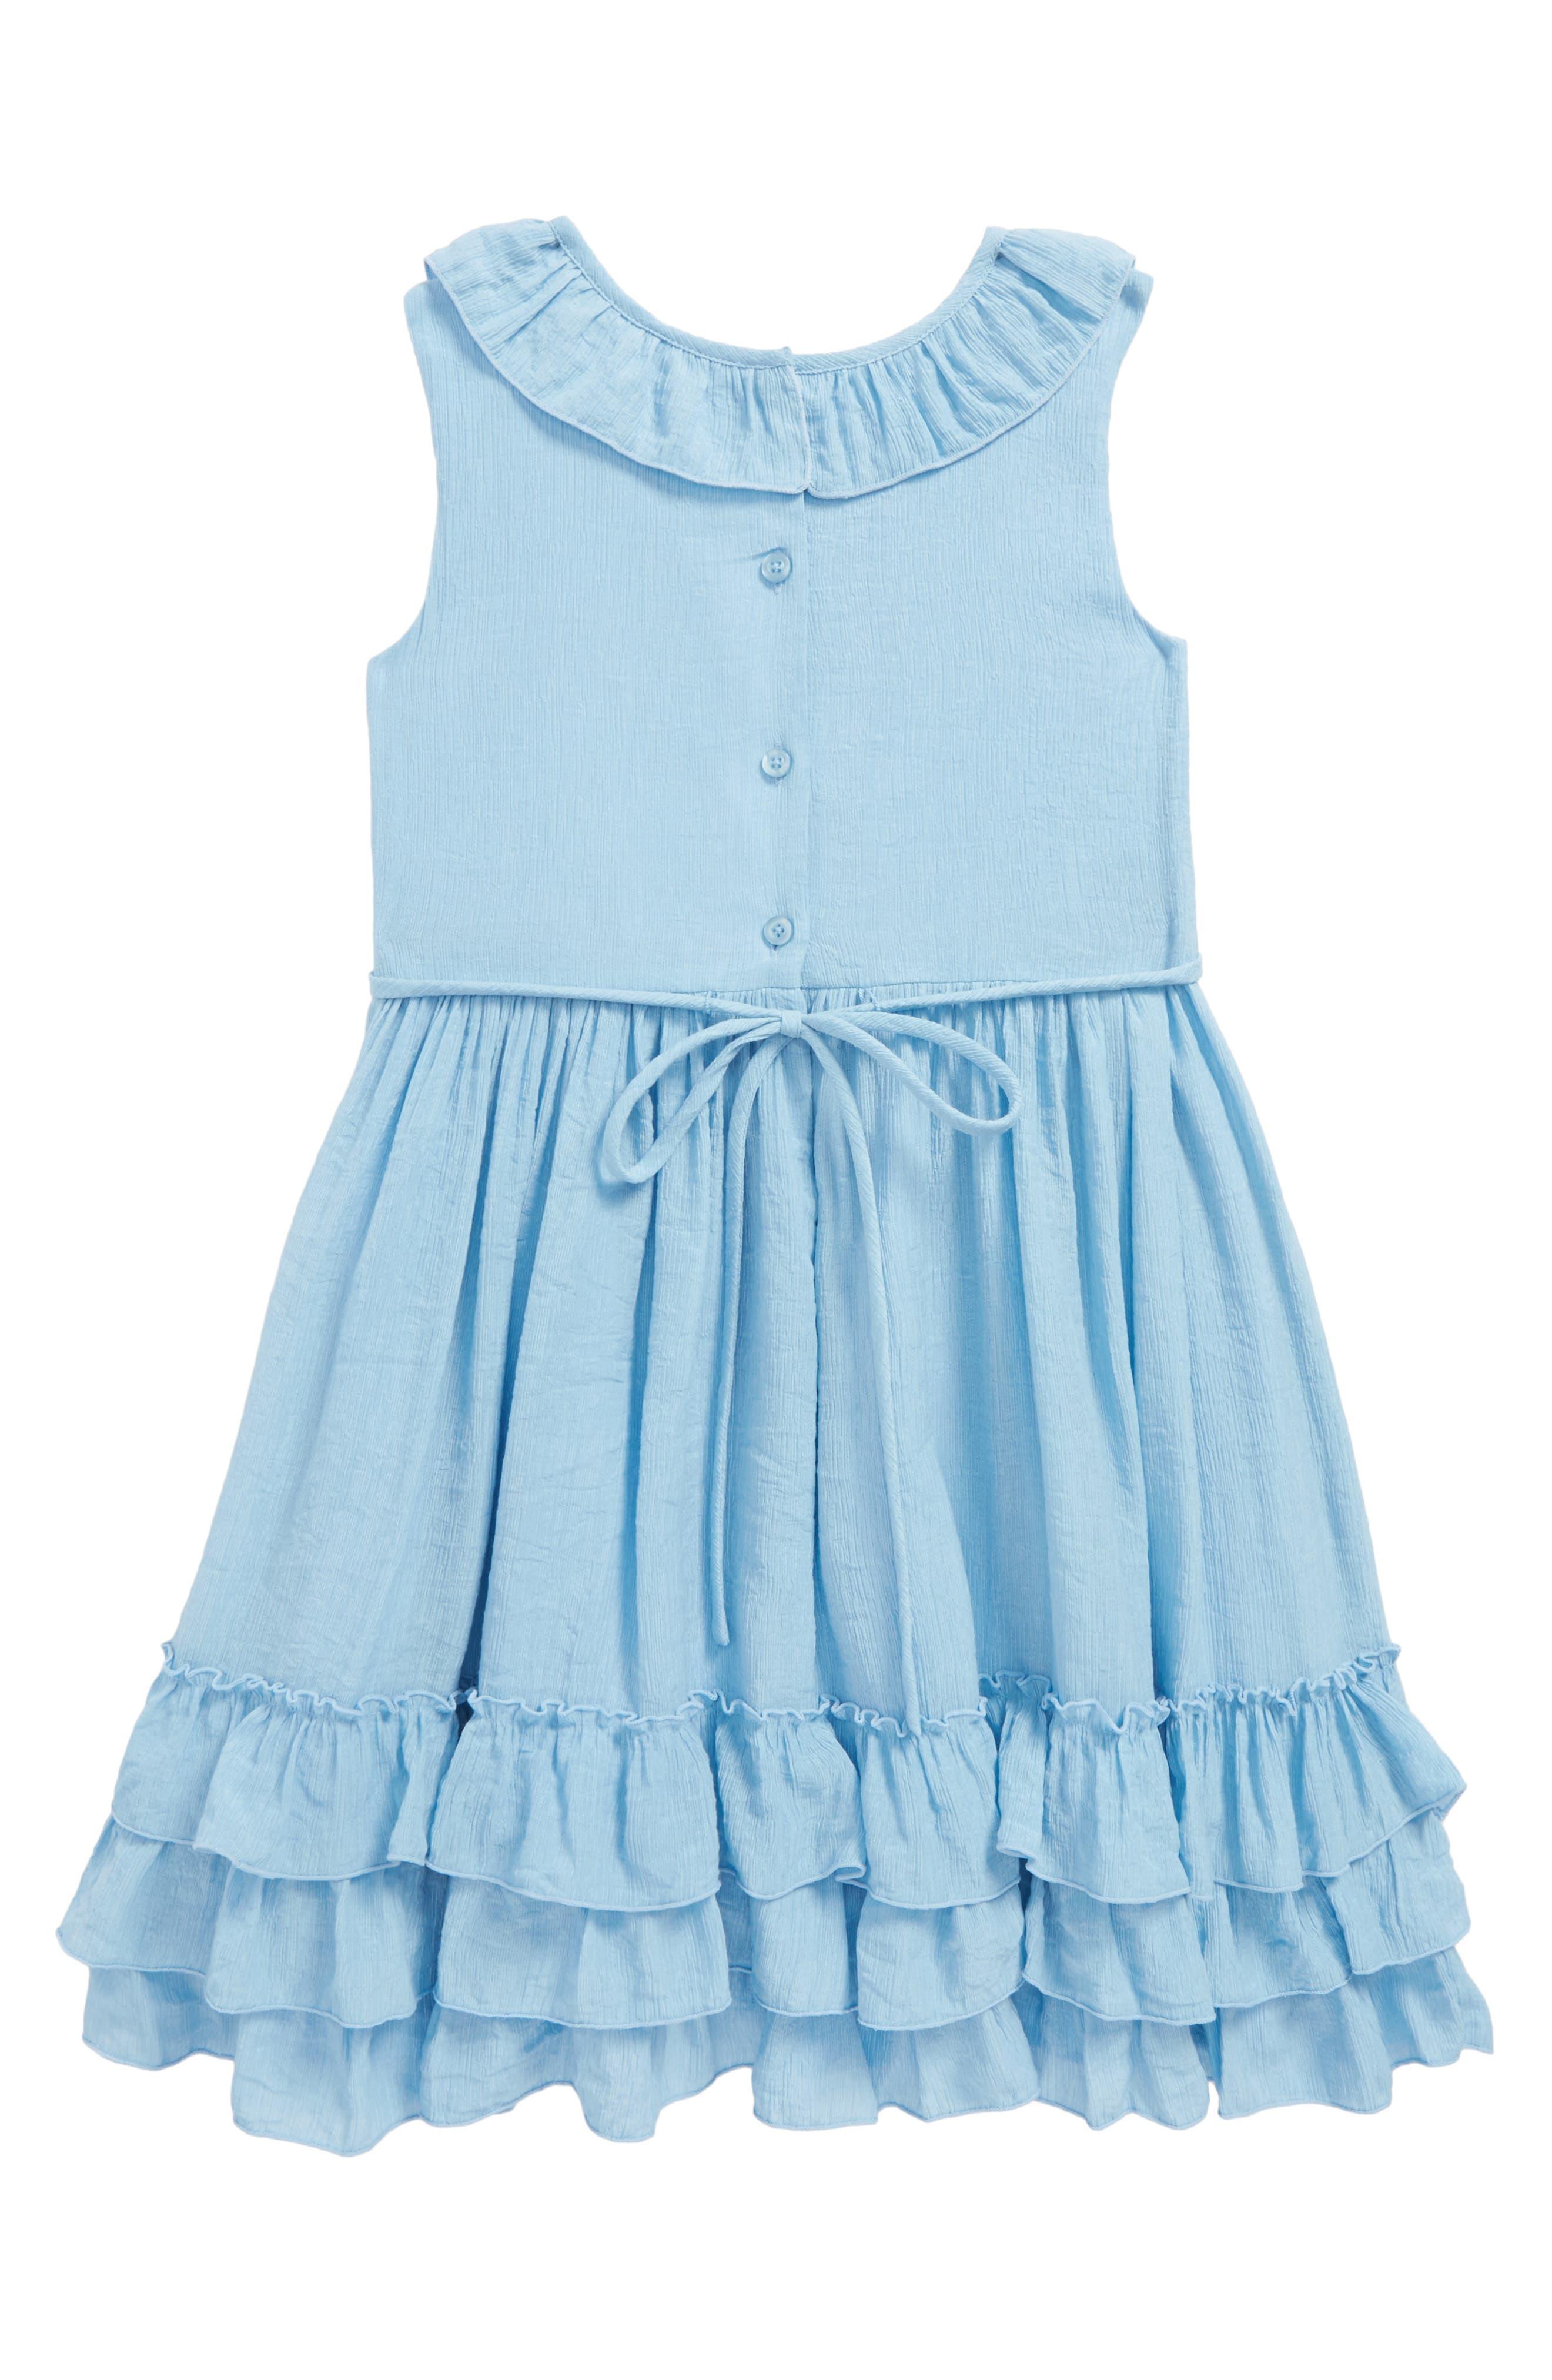 Ruffle Dress,                             Alternate thumbnail 2, color,                             Blue